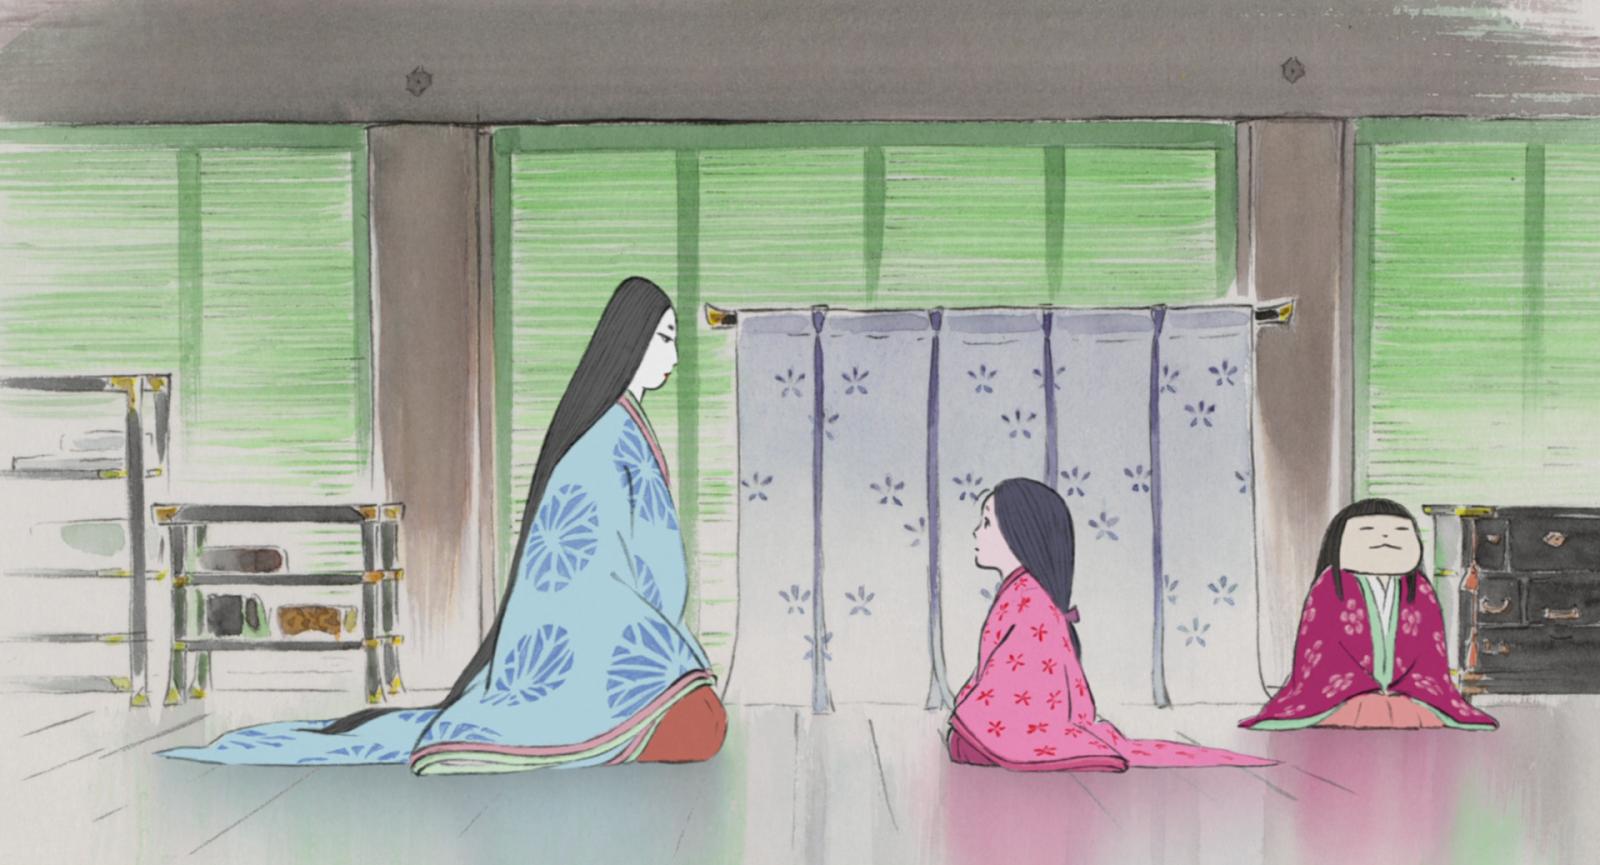 Tale of Princess Kaguya (2013) by Isao Takahata